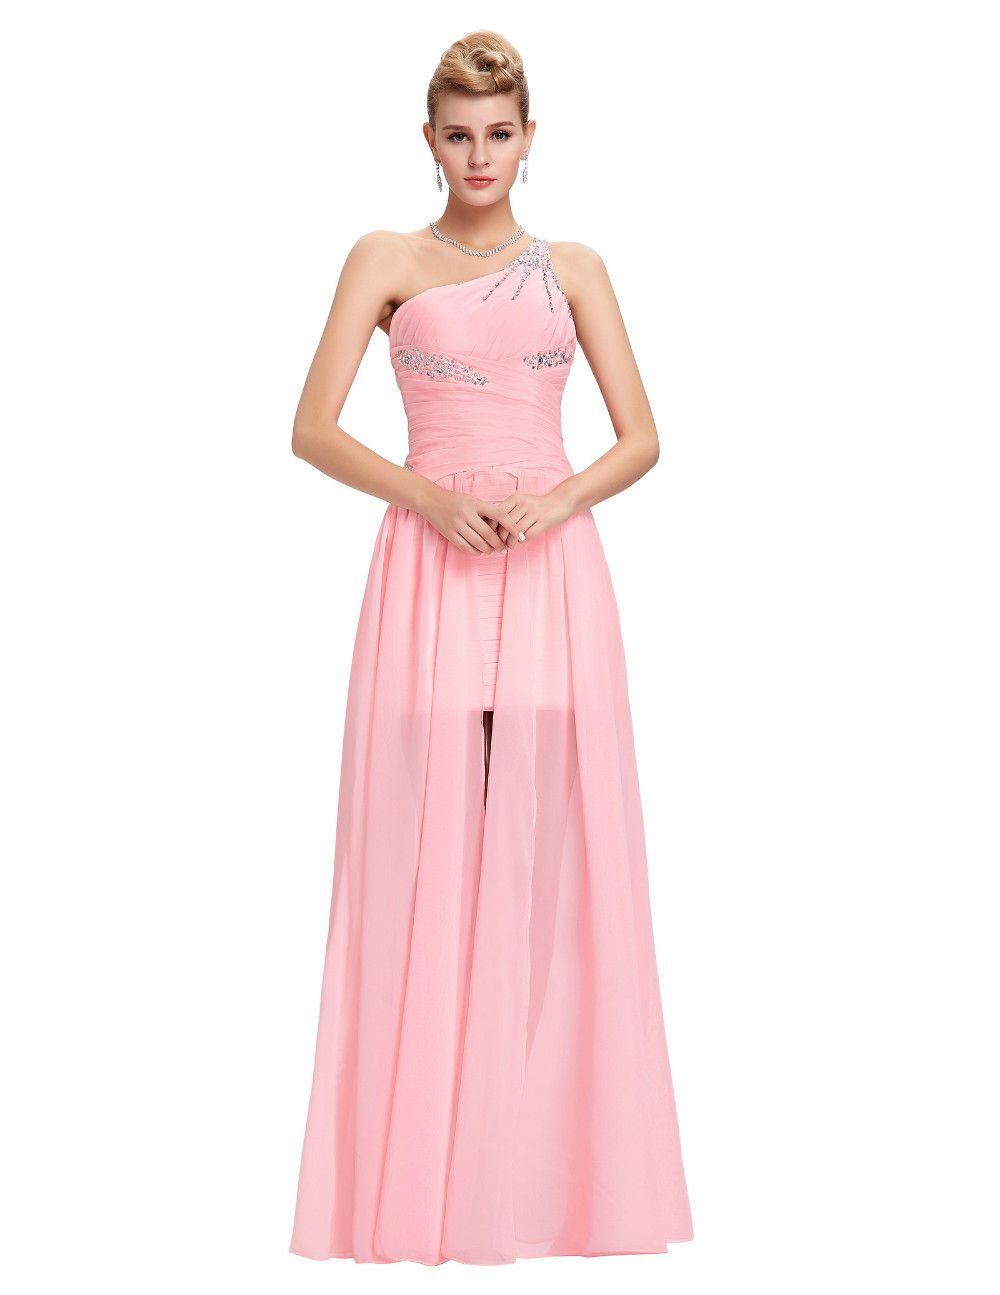 Beaded Chiffon Bridesmaid Dresses